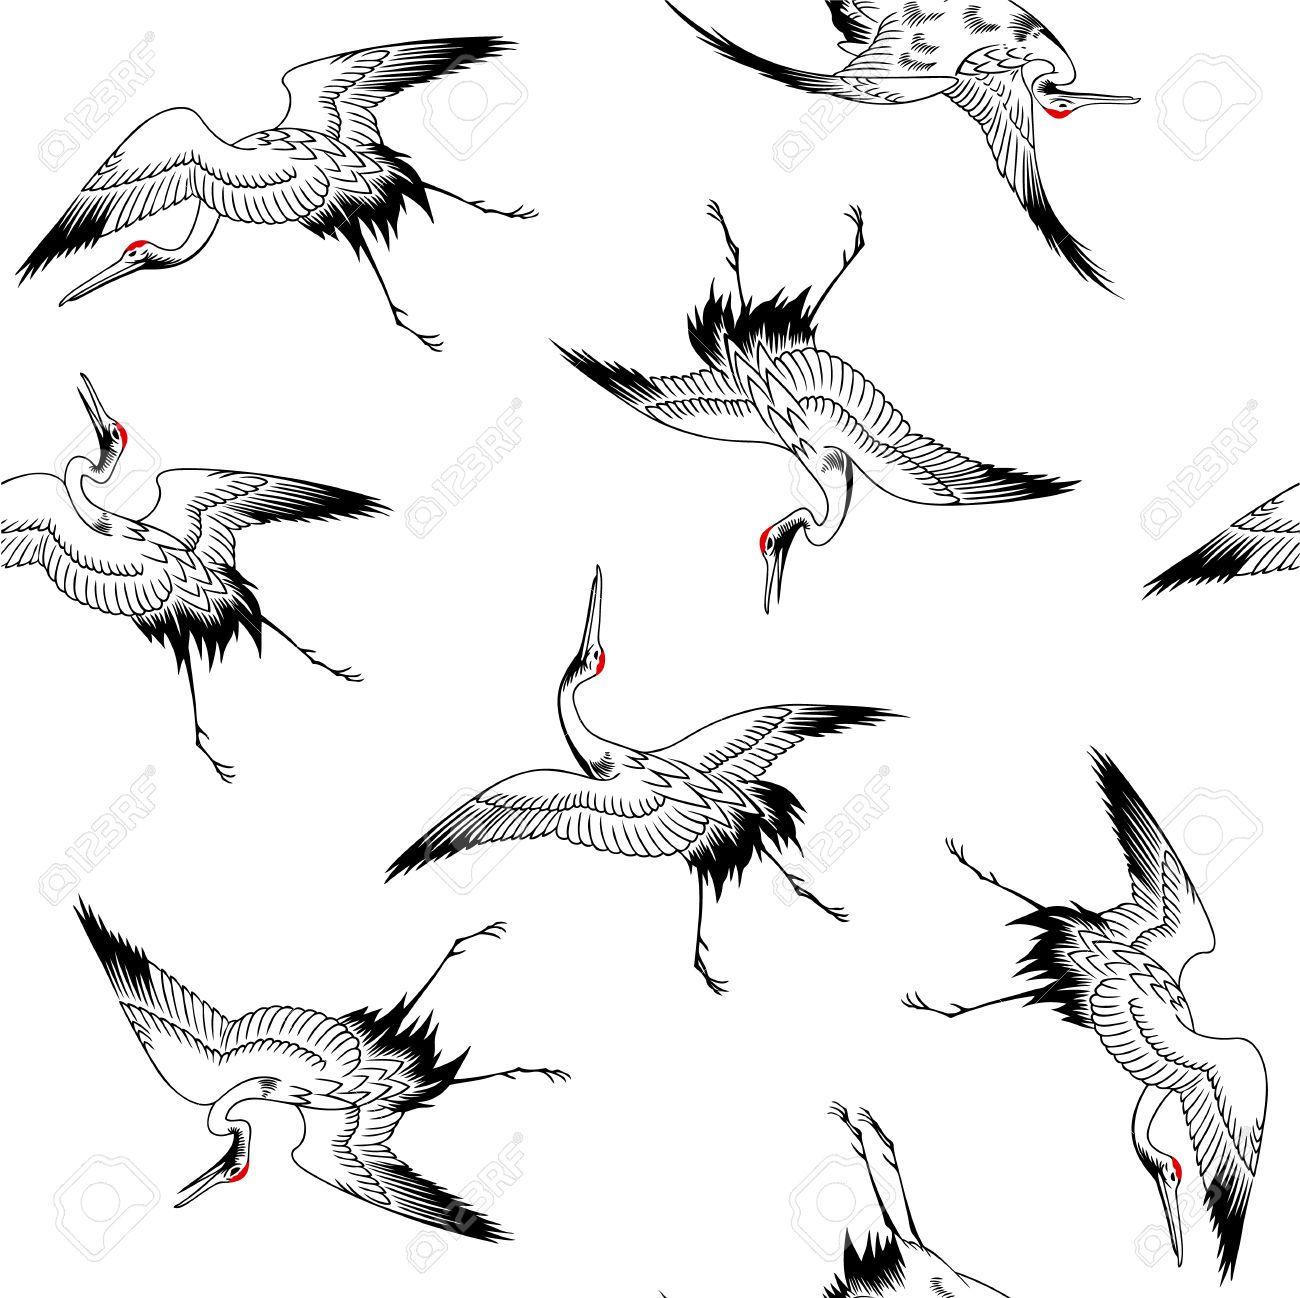 1300x1298 23902835 Japanese Crane Pattern Stock Vector Crane Bird.jpg (1300